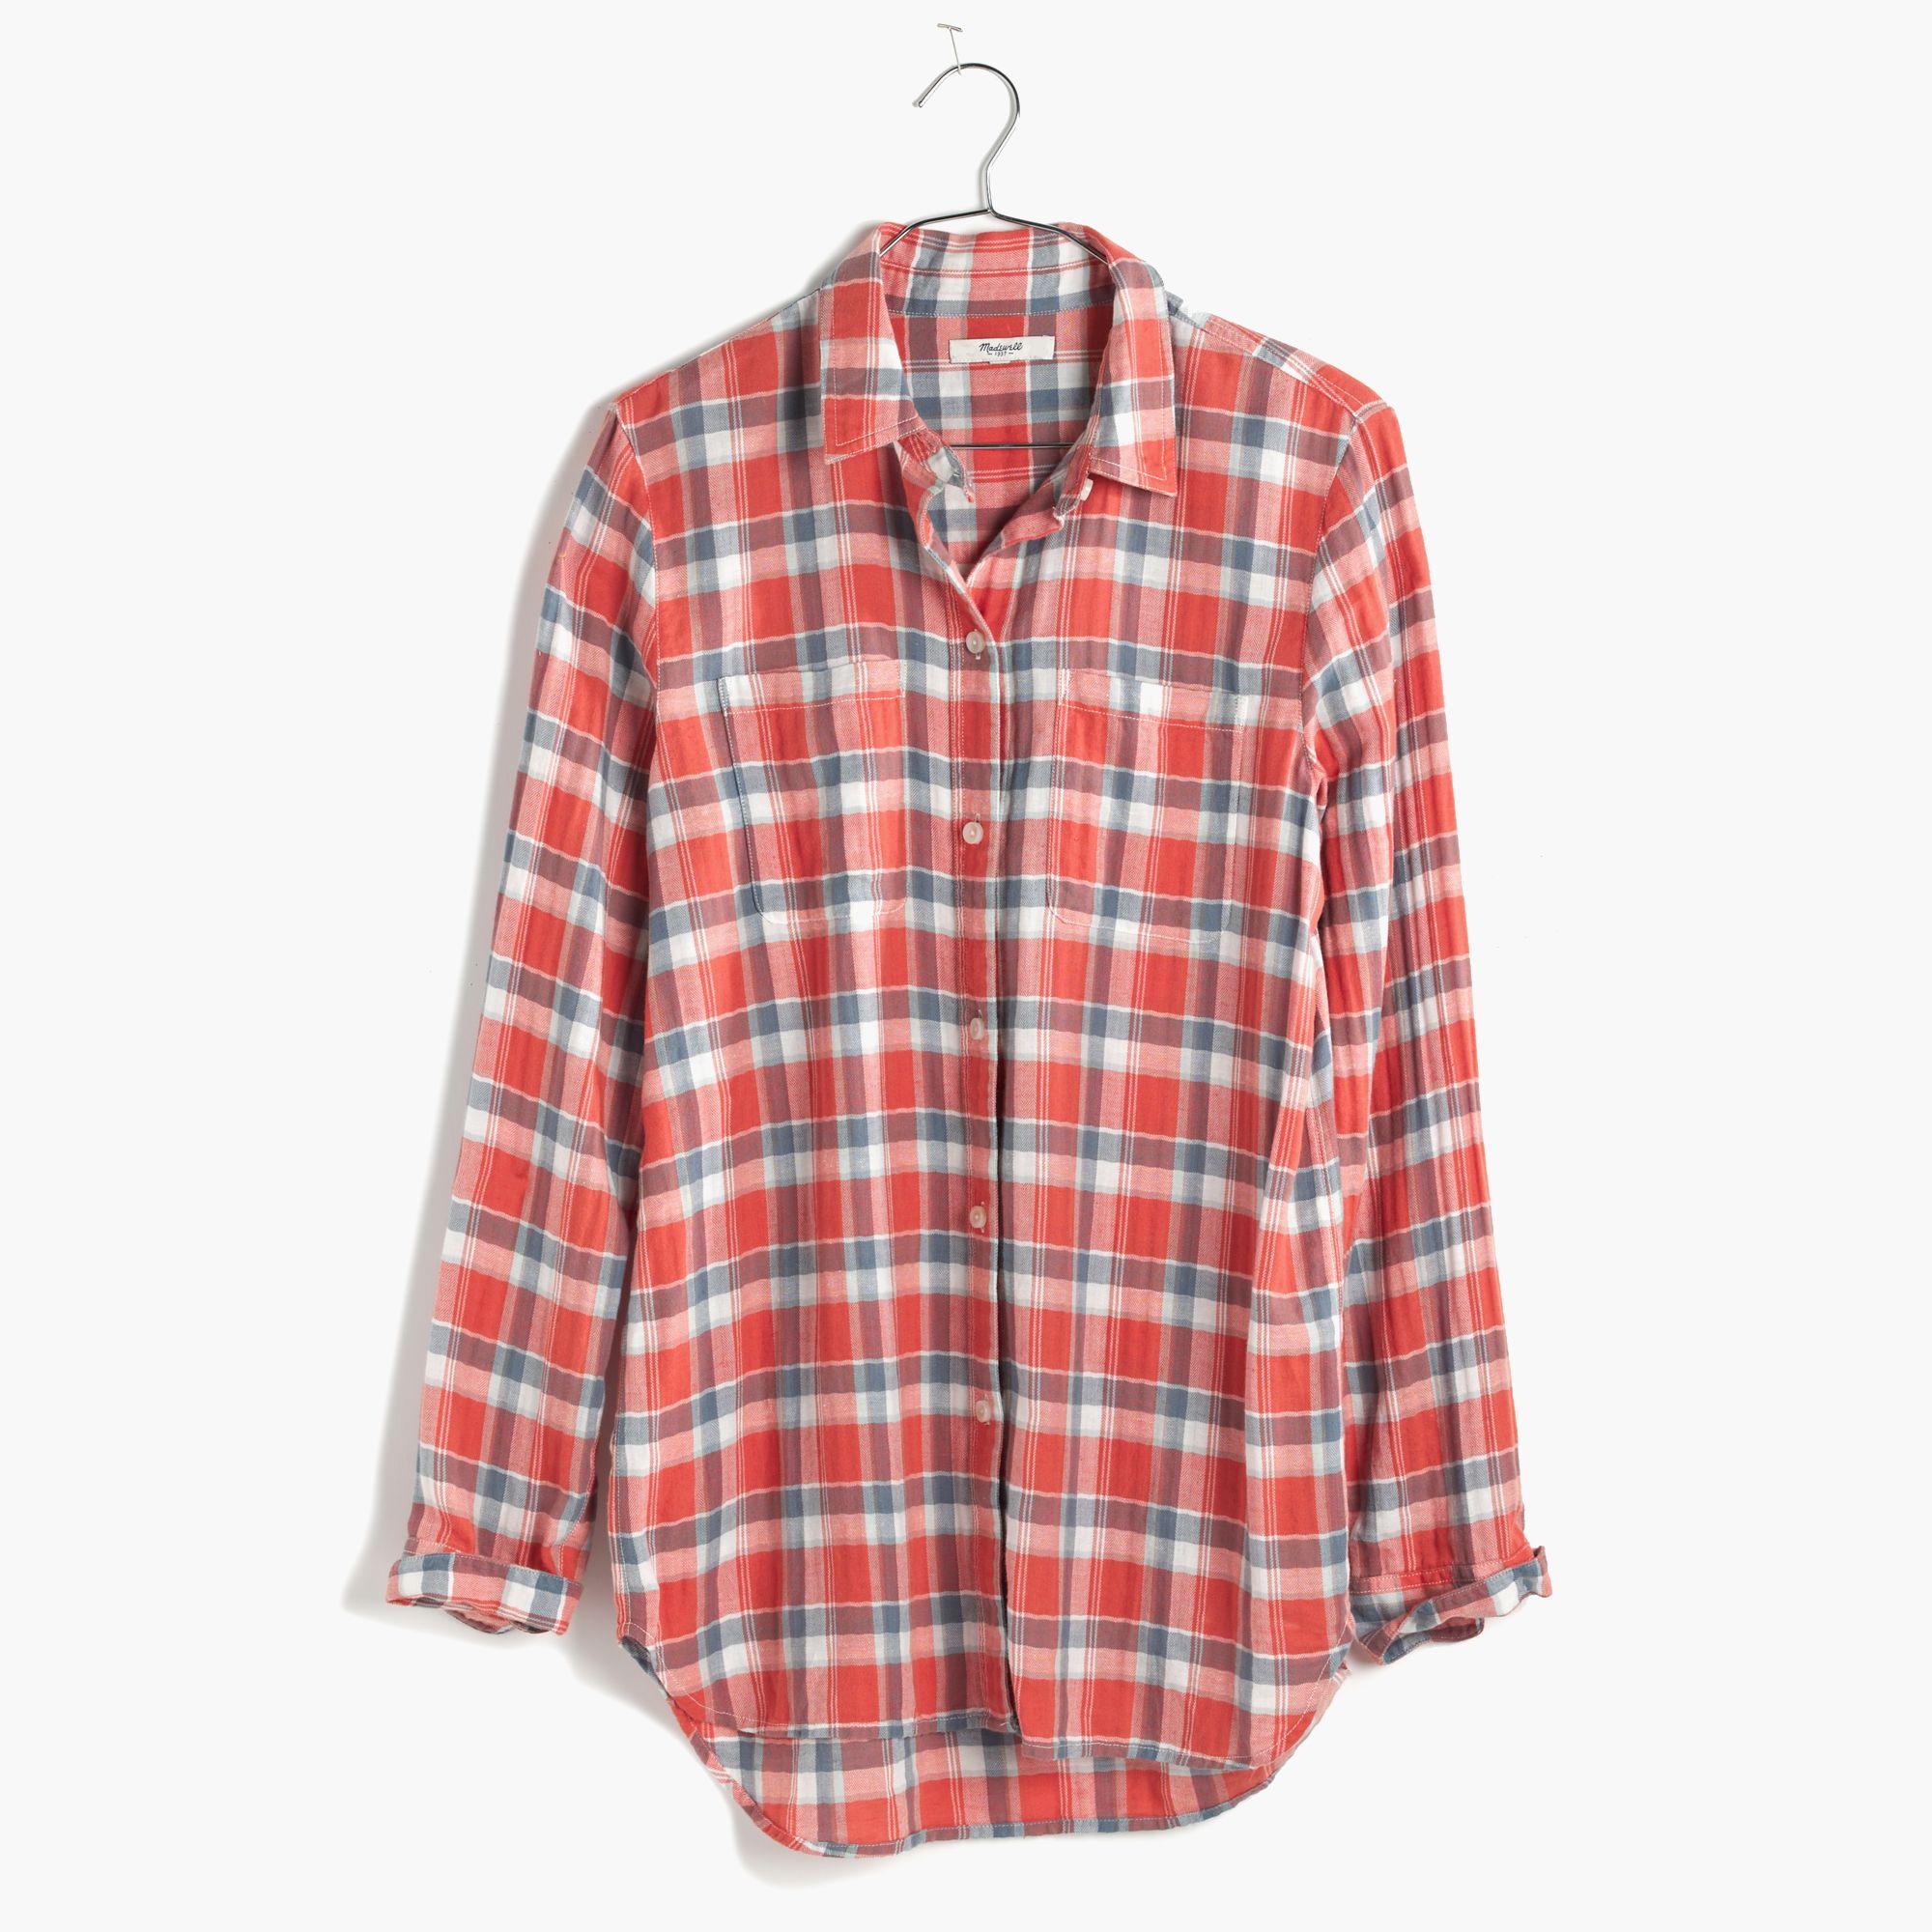 Madewell Ex Boyfriend Shirt In Orange Plaid In Red Lyst